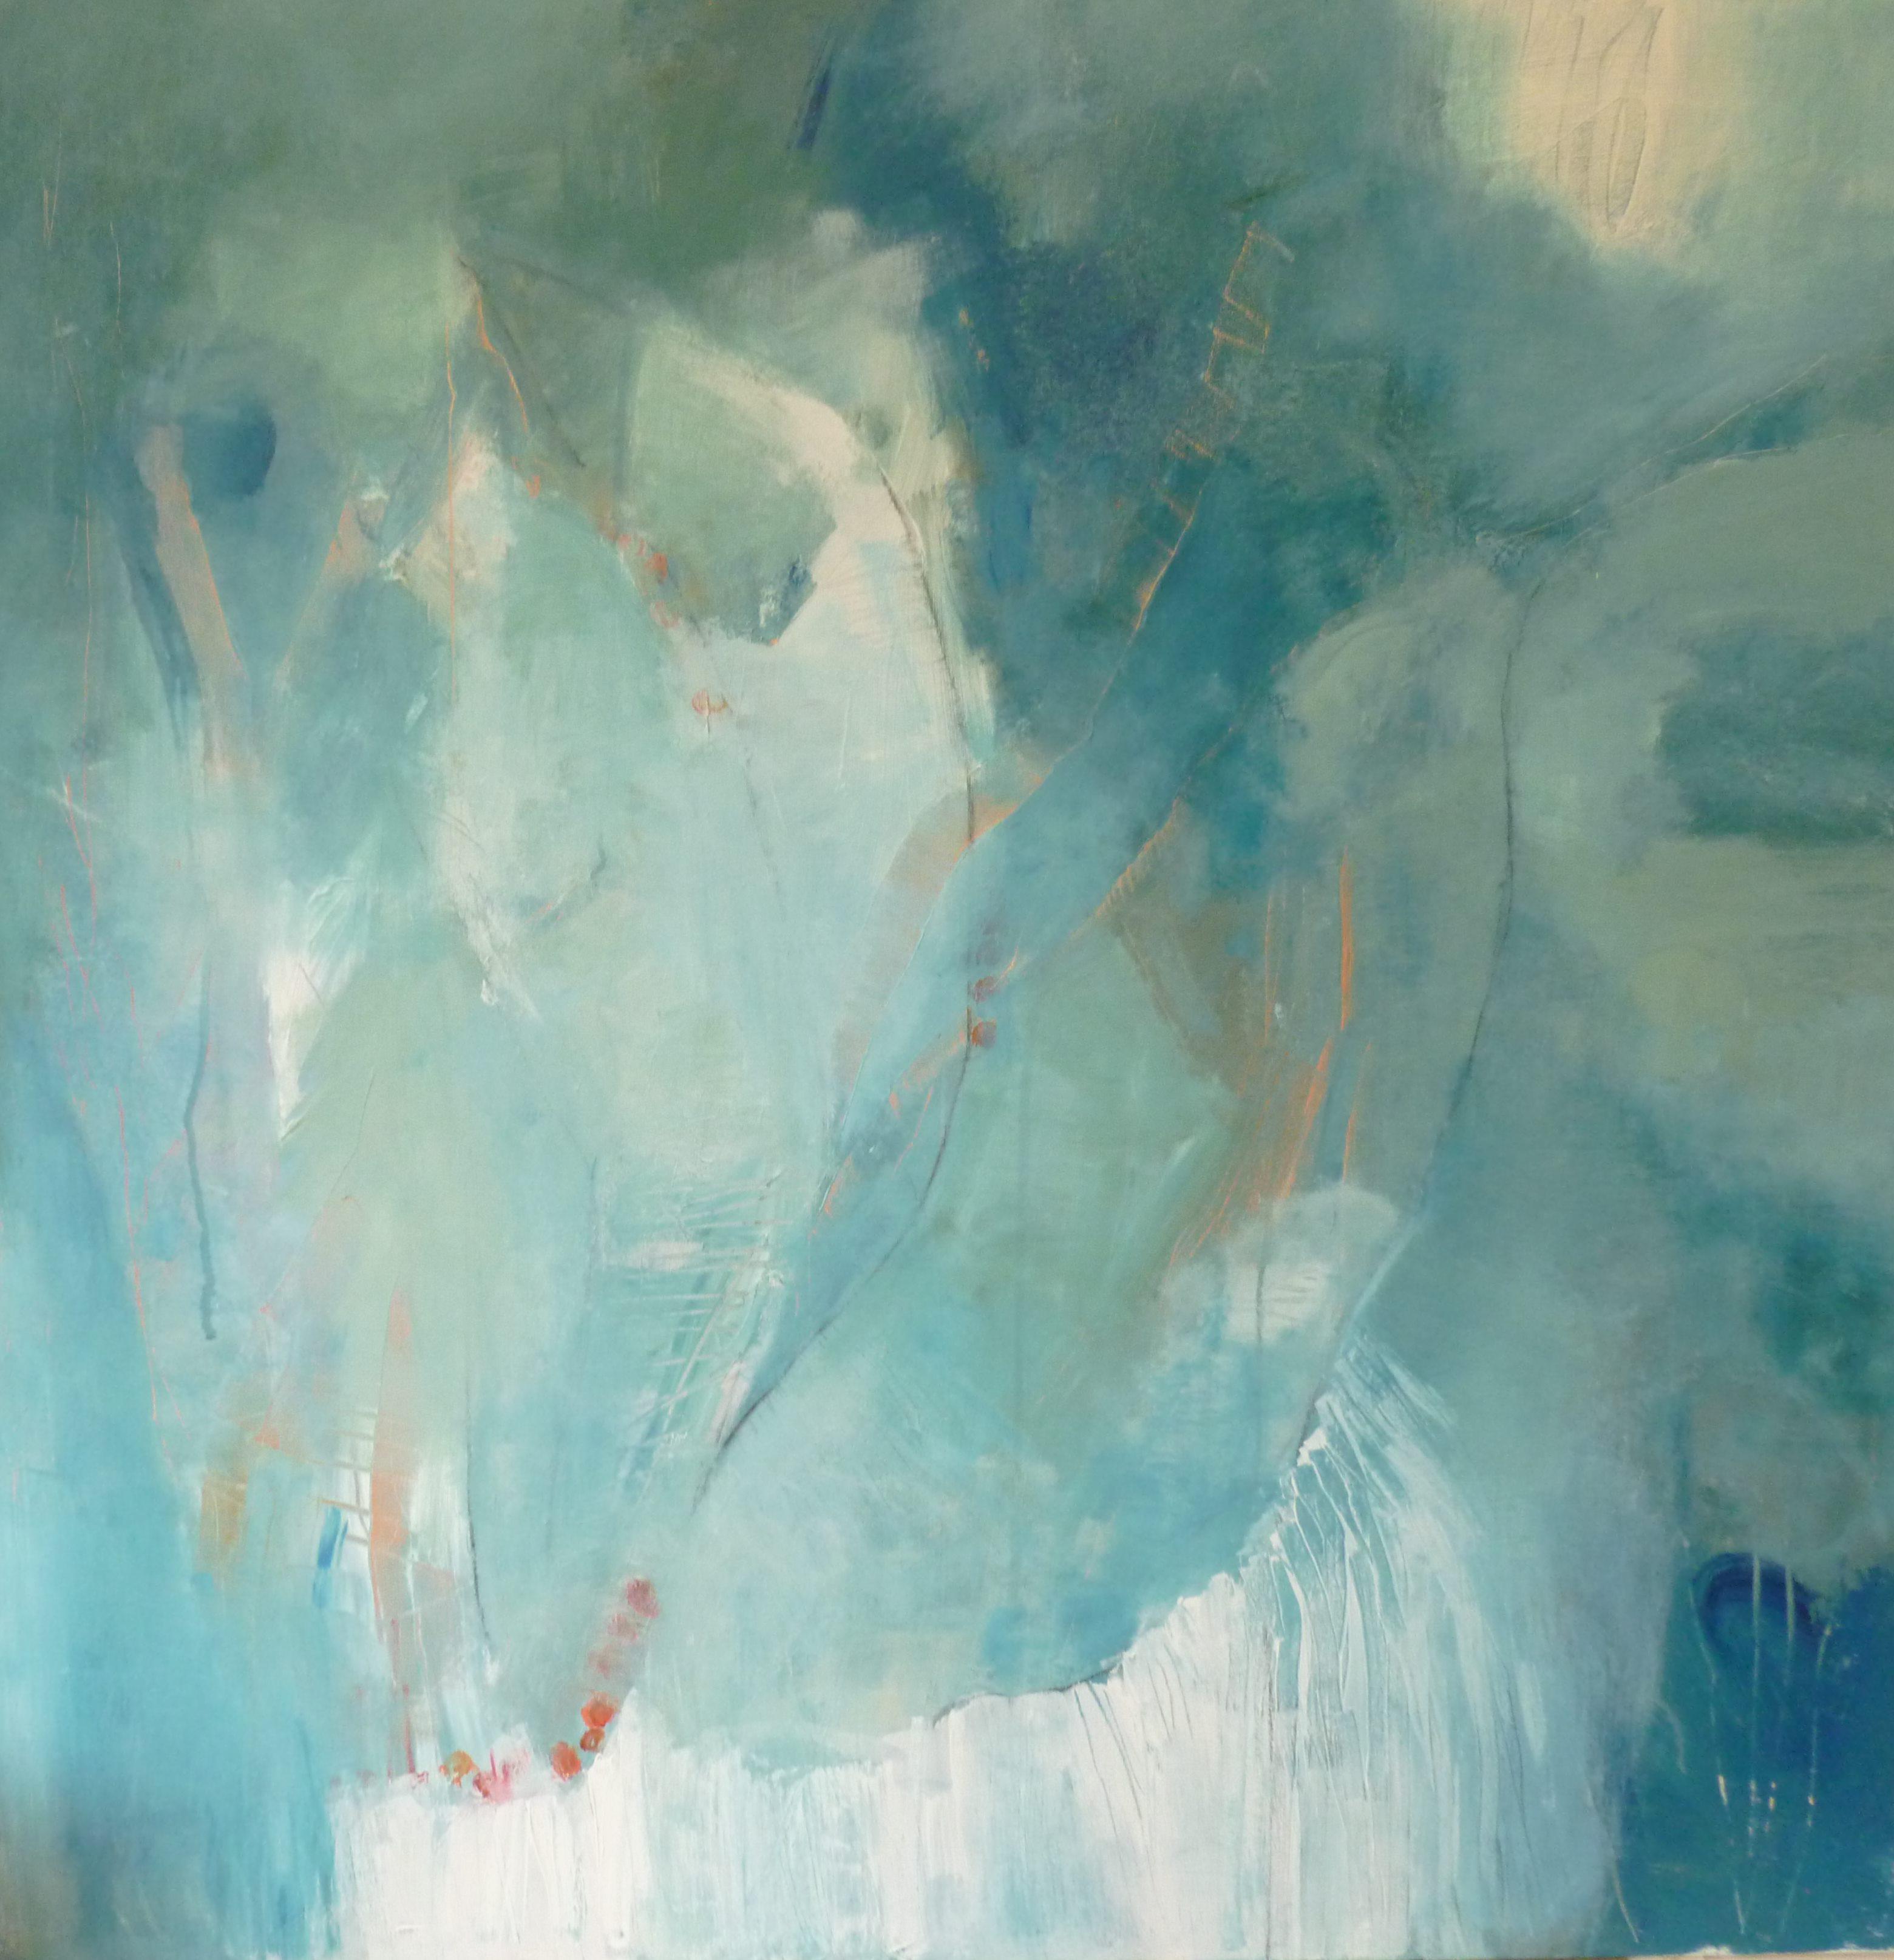 Staacks: 'Tiny Islands' by Fiona Philipps